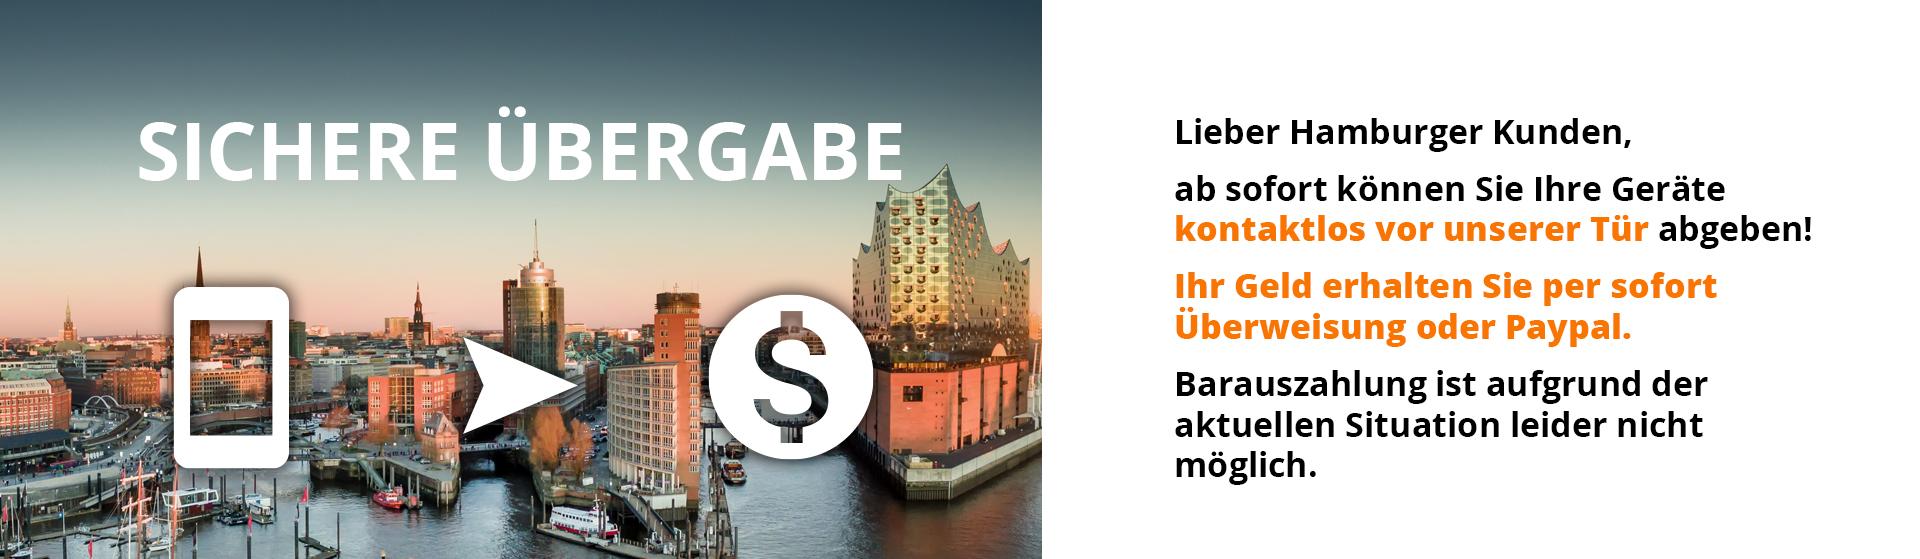 Handy verkaufen Hamburg kontaktlos